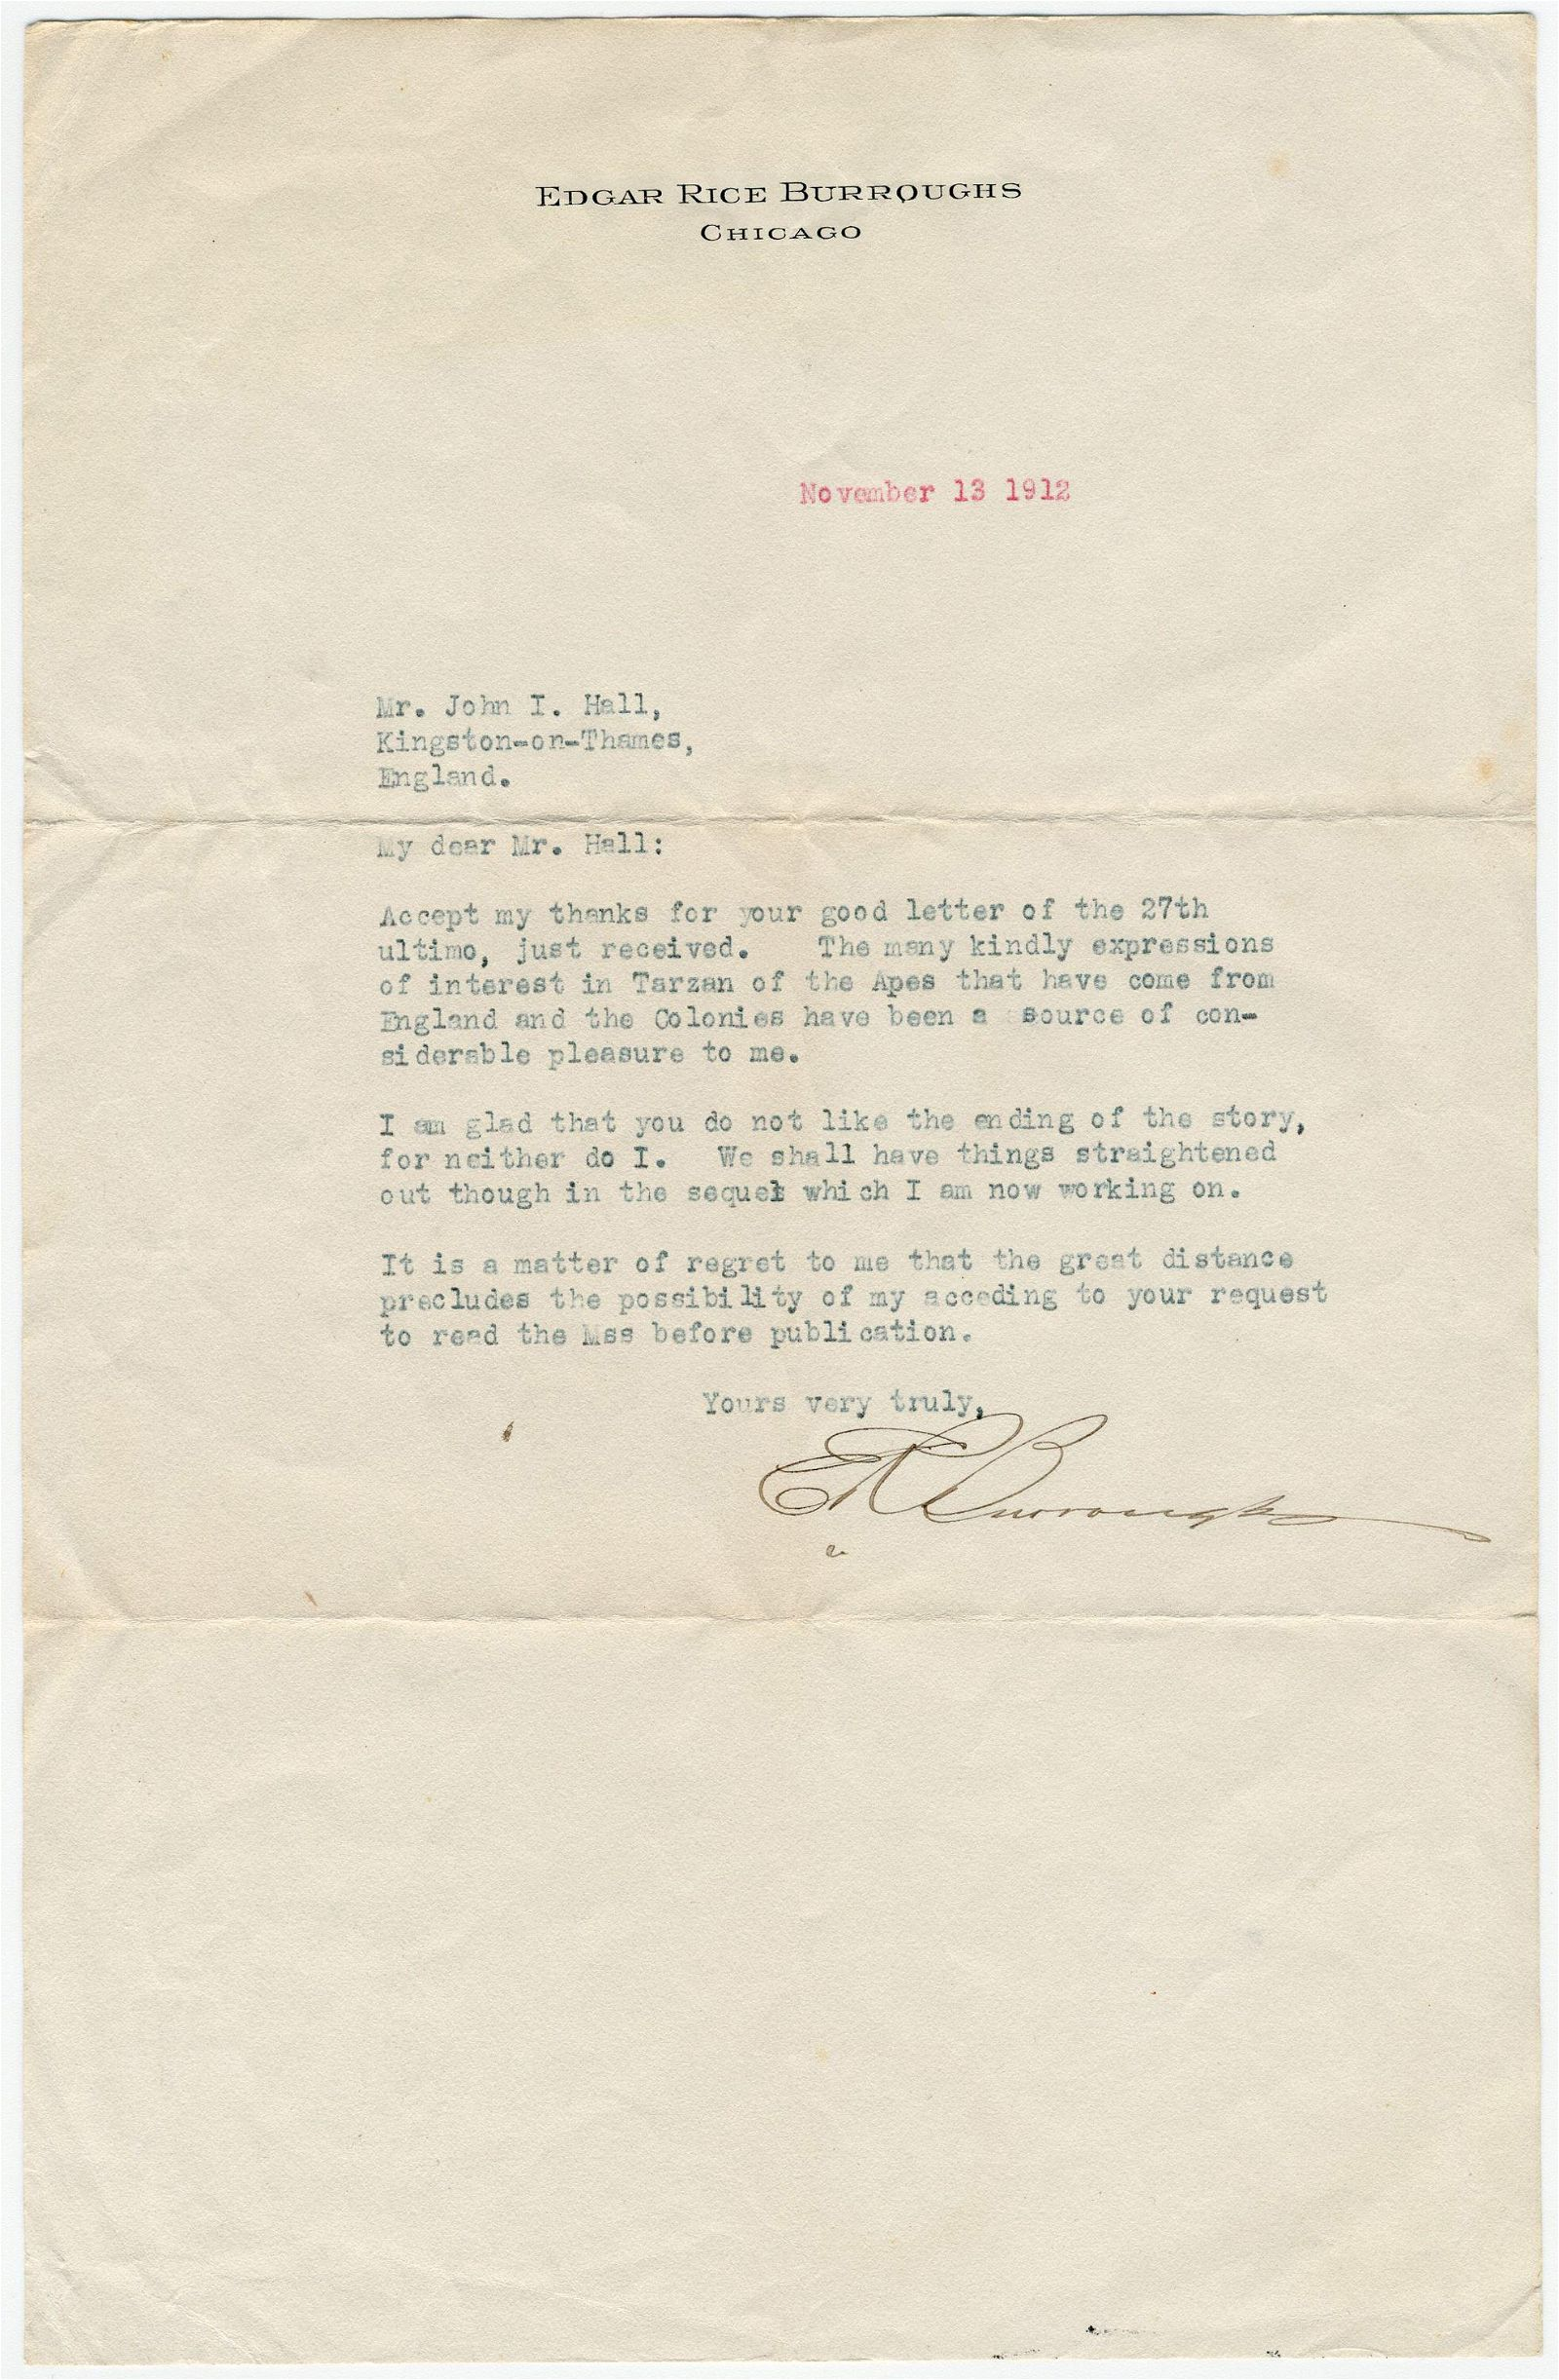 Edgar Rice Burroughs TLS Re: Unsatisfactory Ending of